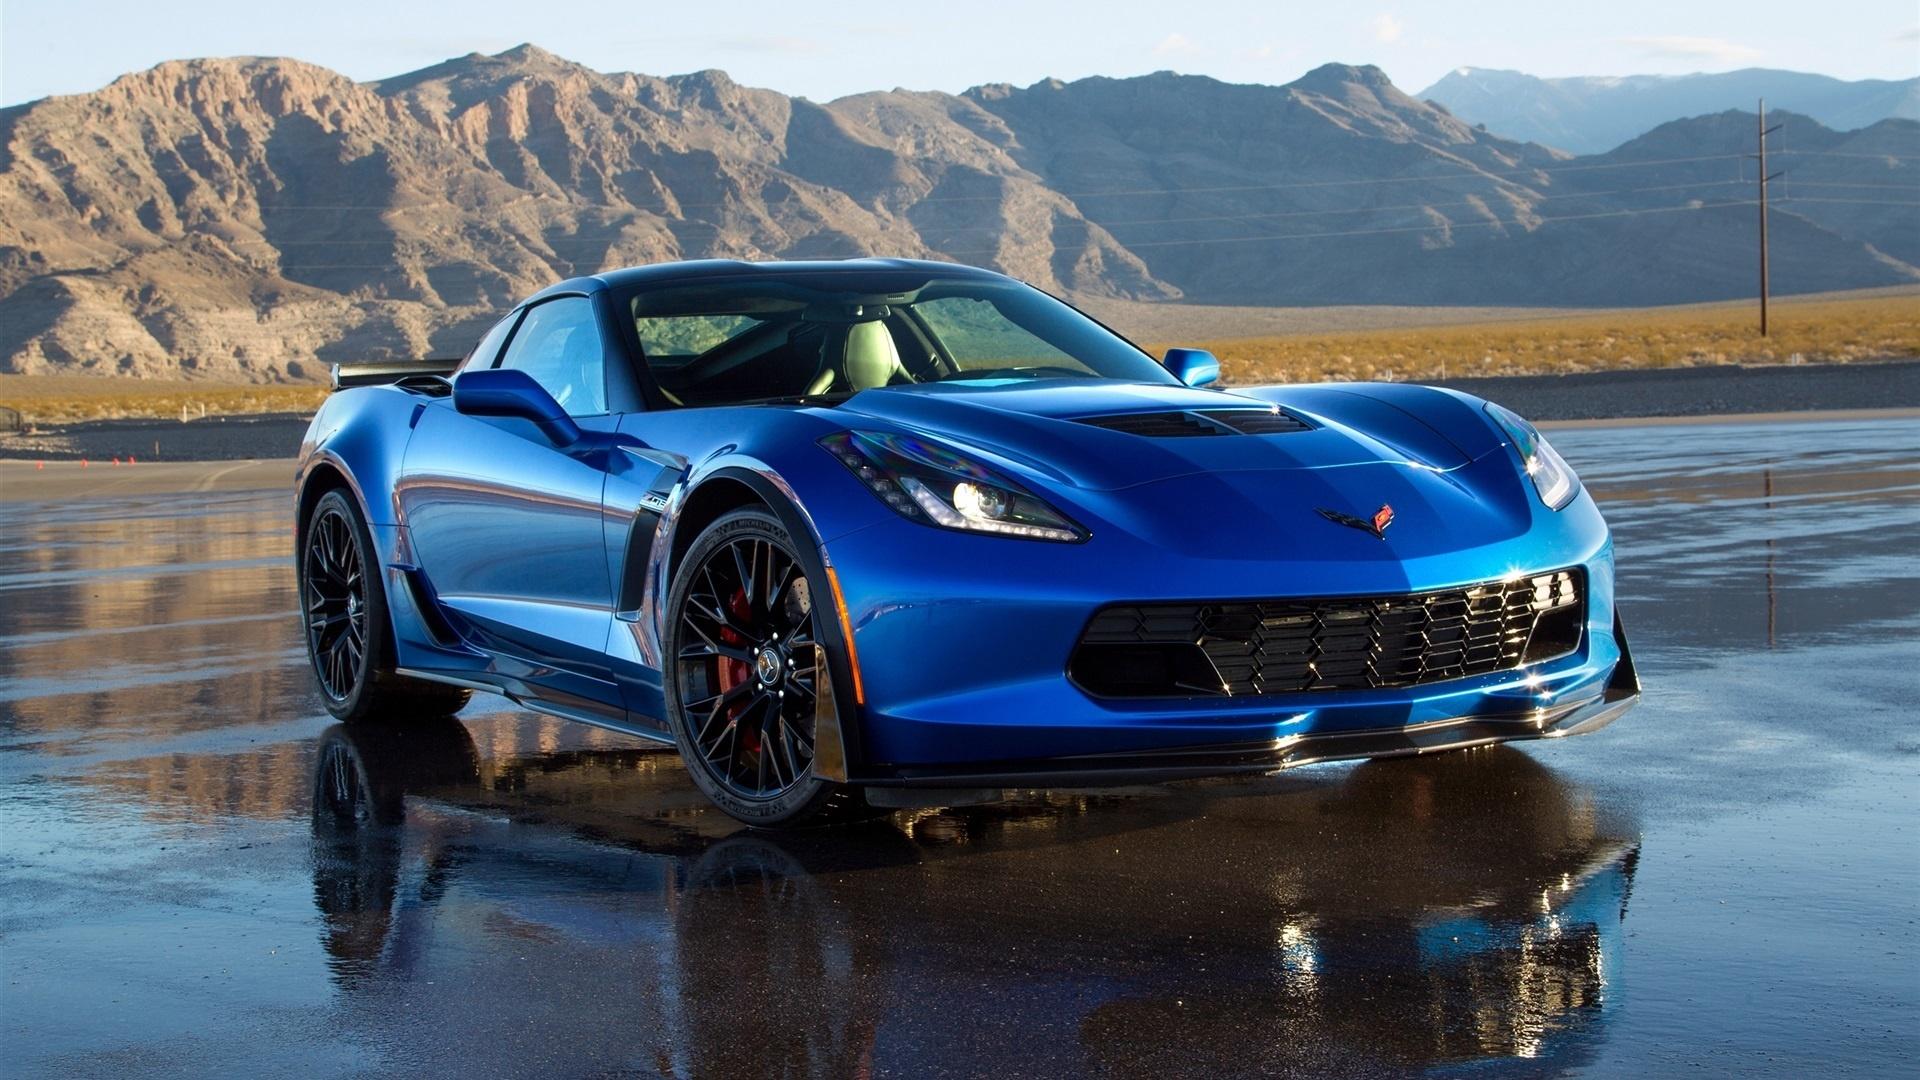 Corvette free pic